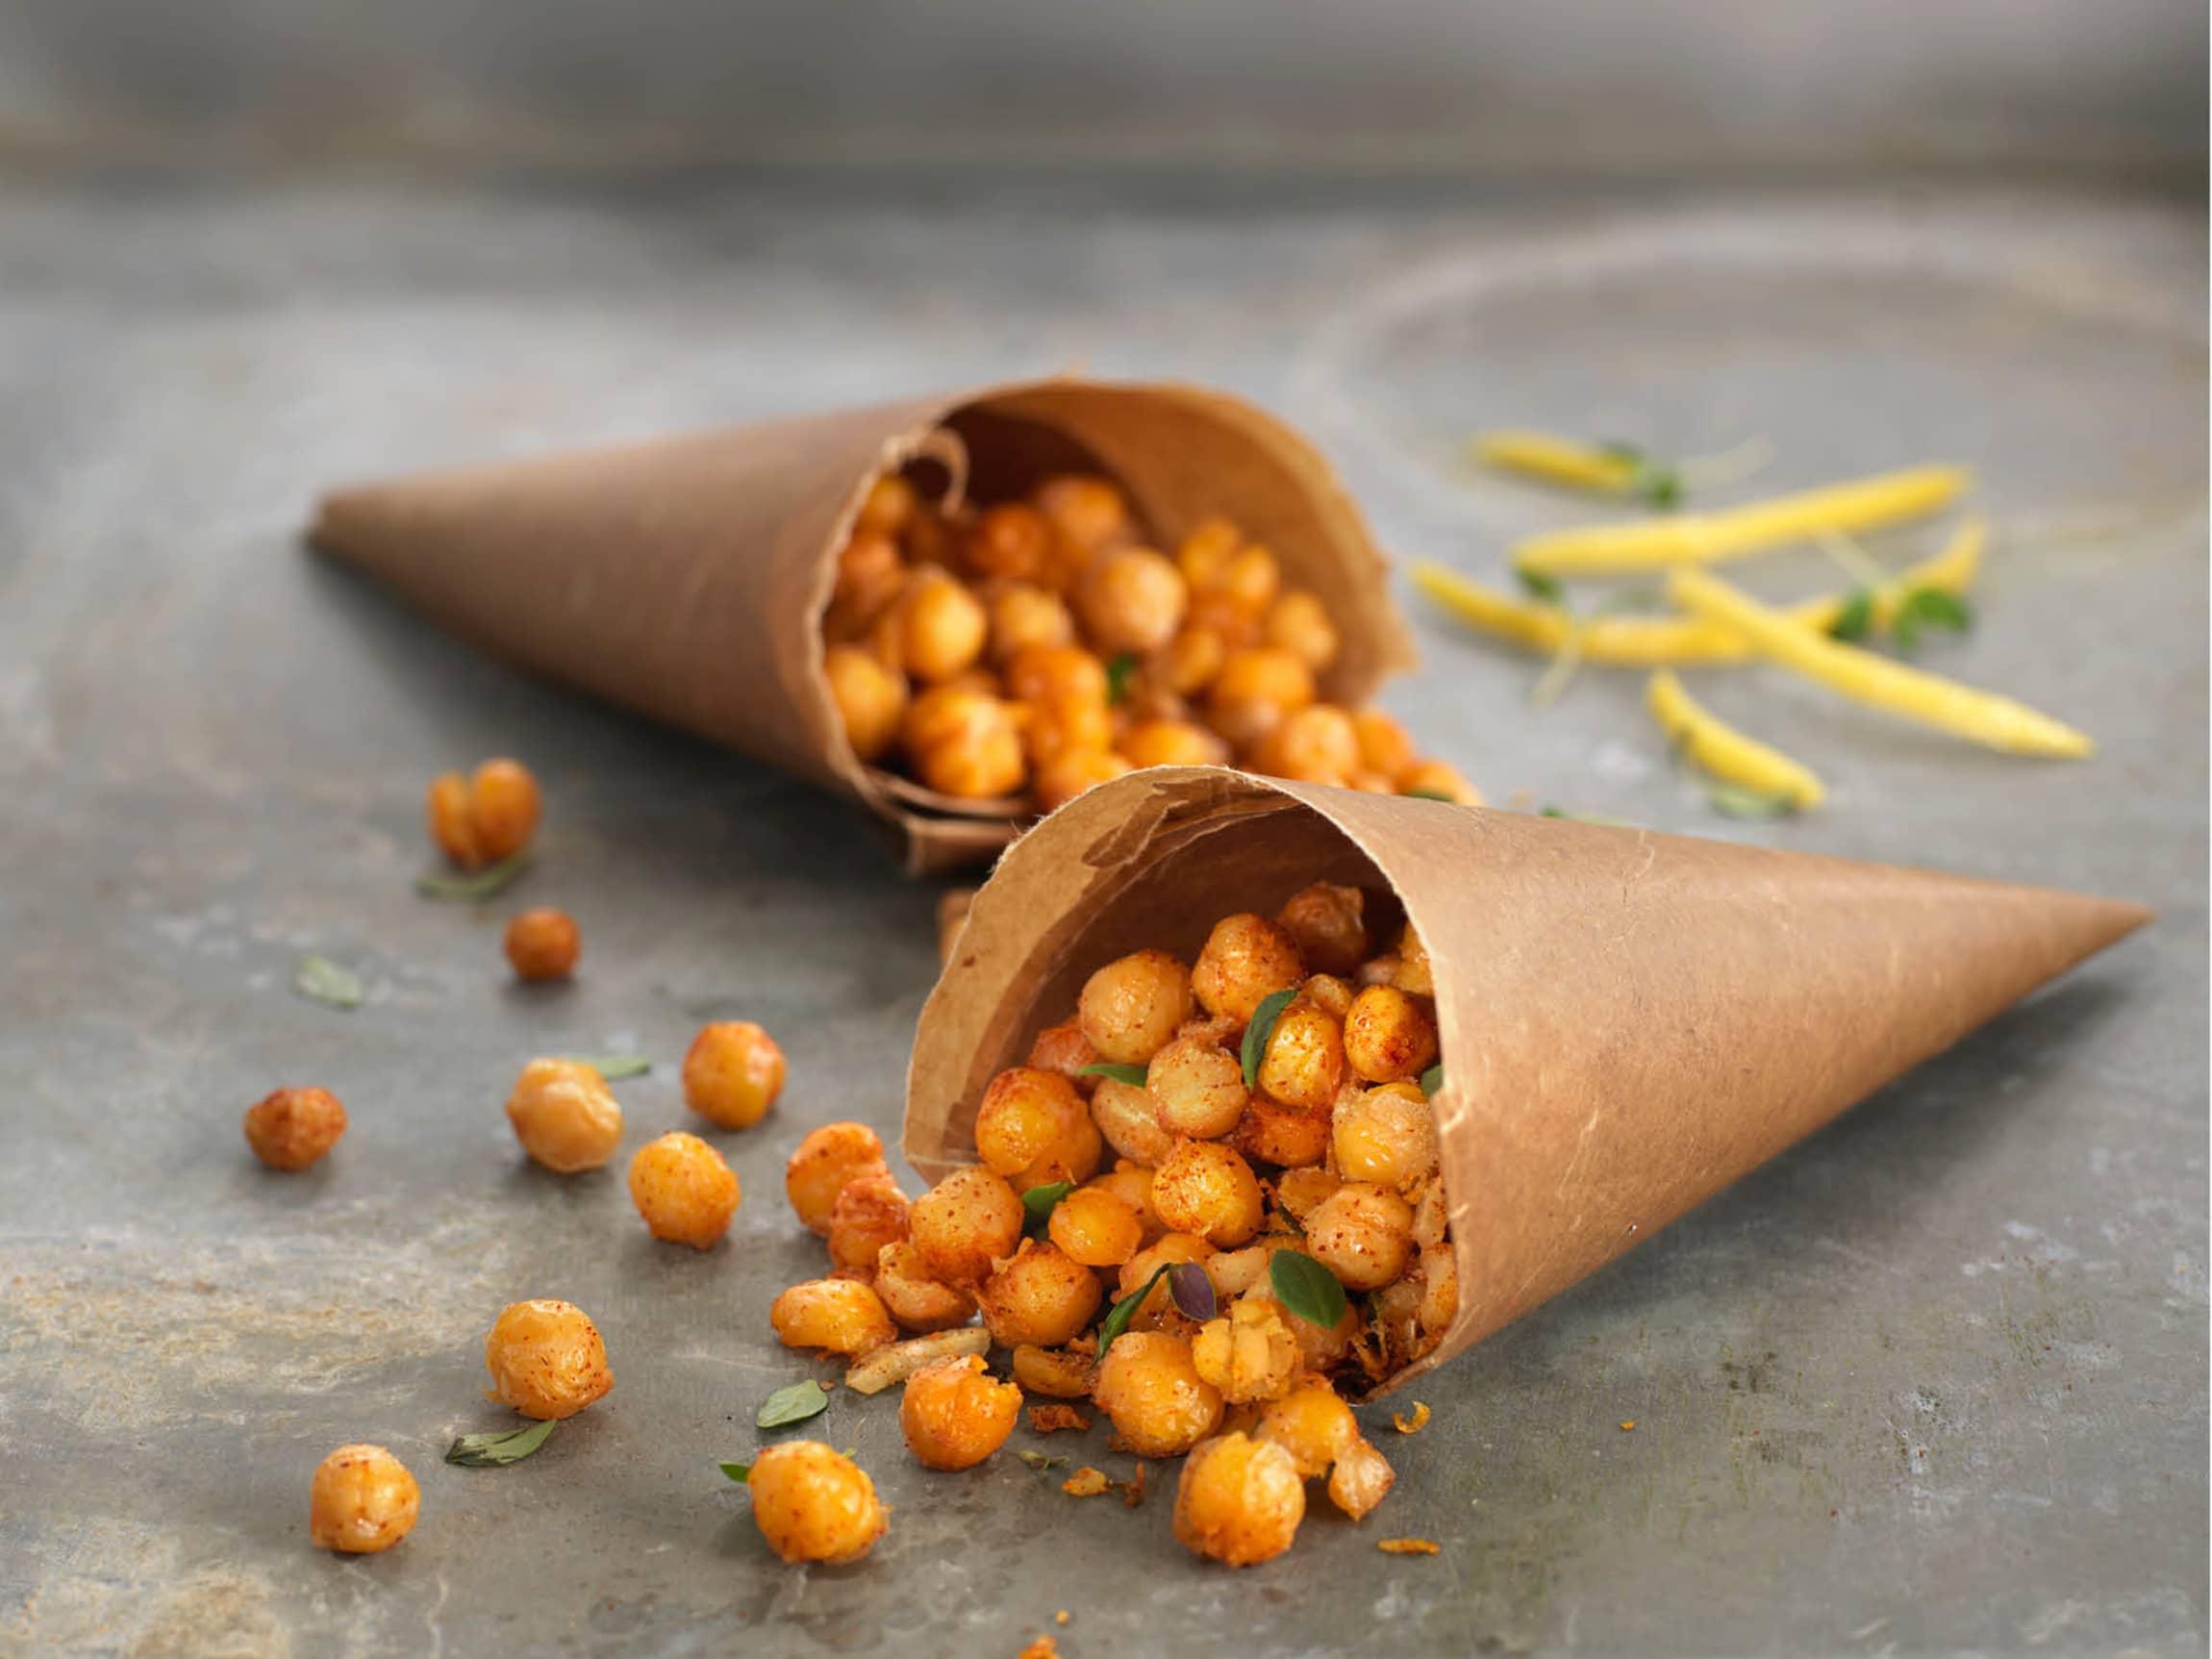 Ristede kikerter er en kjempegod snack! Krydre dem med spenstige krydder etter eget ønske, eller bare med salt og pepper.